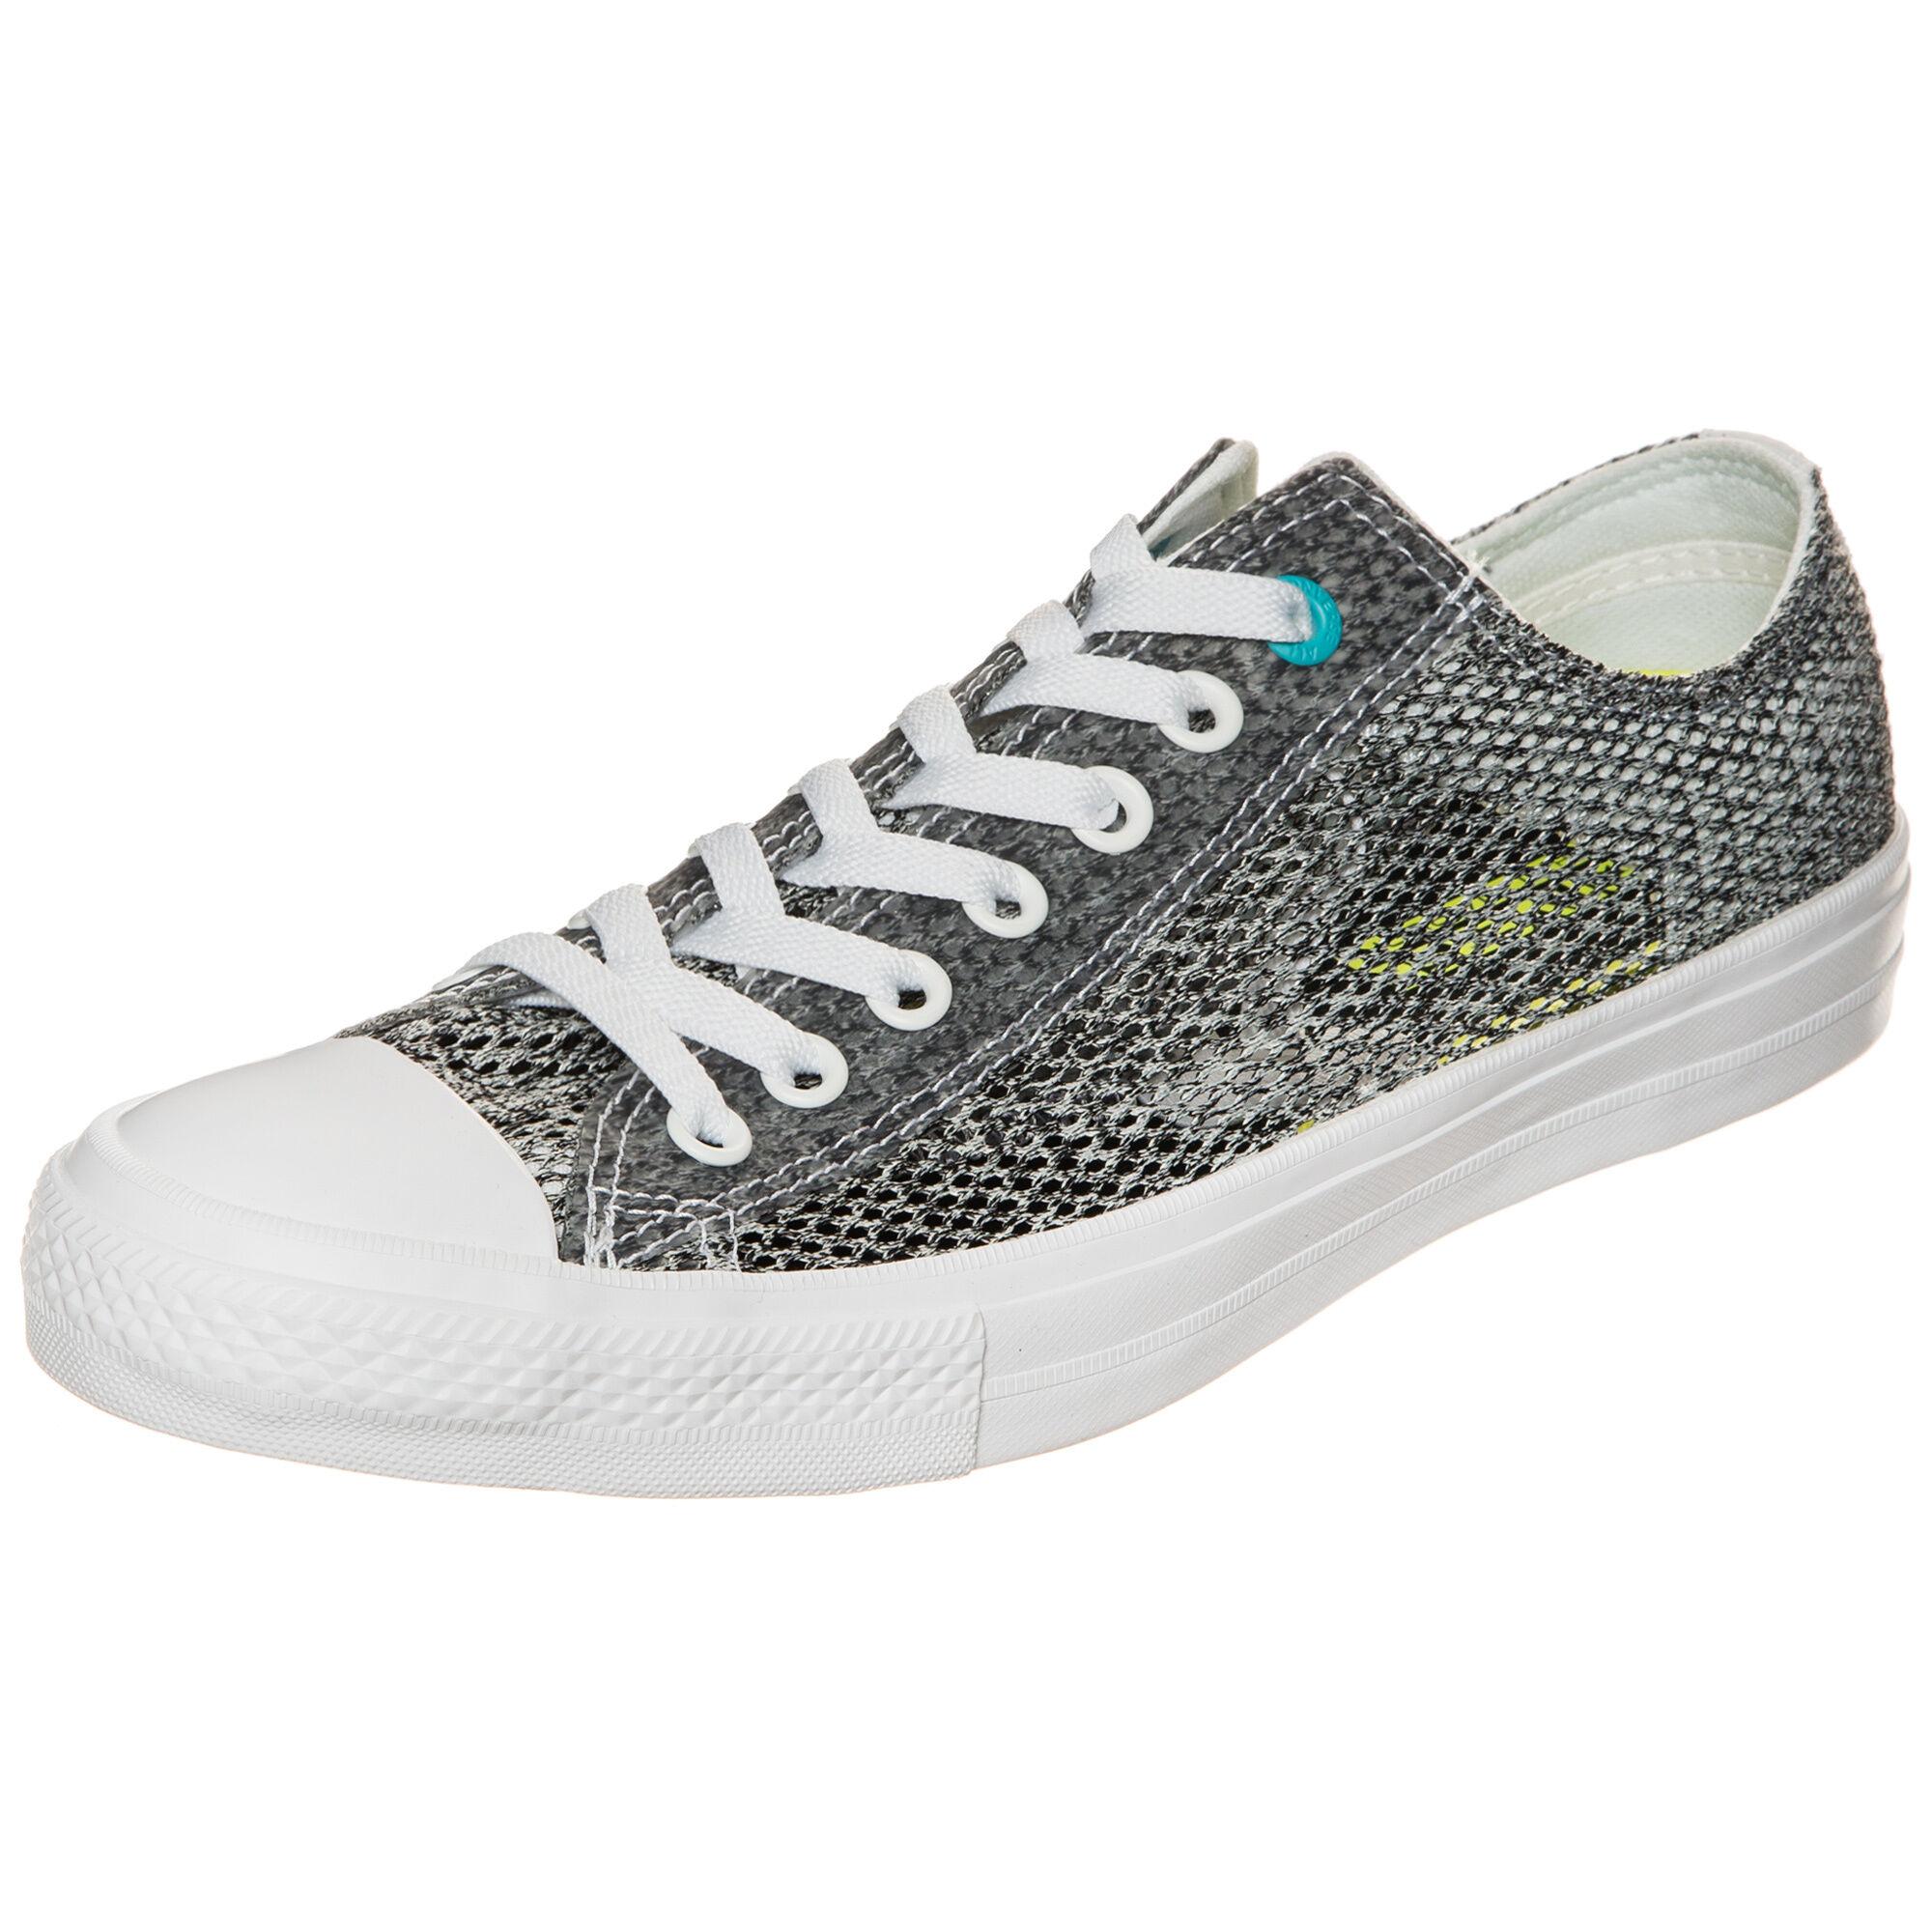 Converse Chuck Taylor All Star II Ox Sneaker Grau